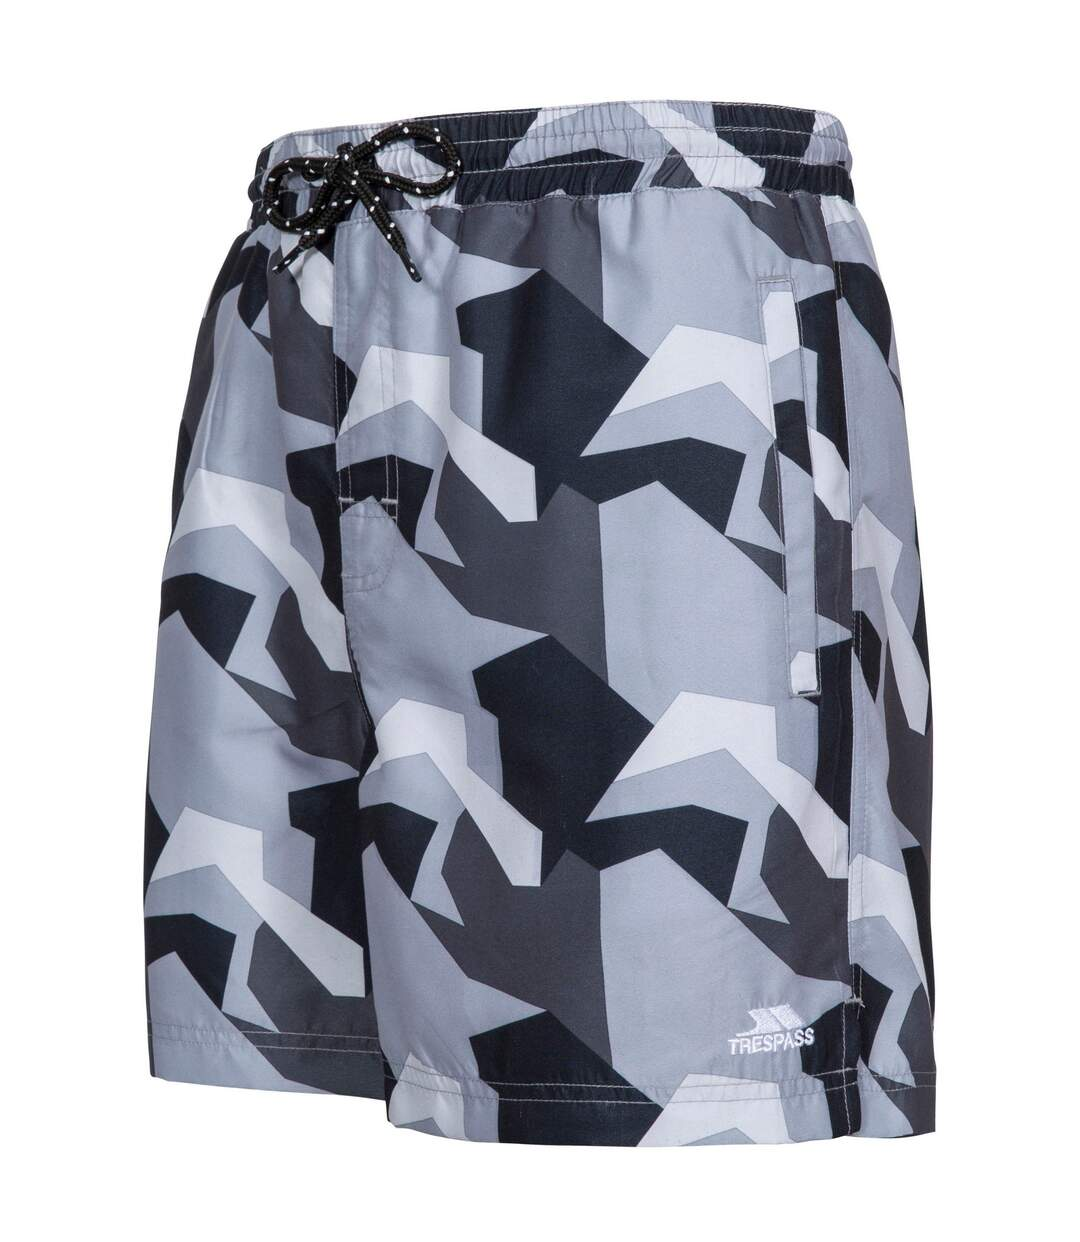 Trespass Mens Chiggers Mid Length Swim Shorts (Blue Camo) - UTTP4691